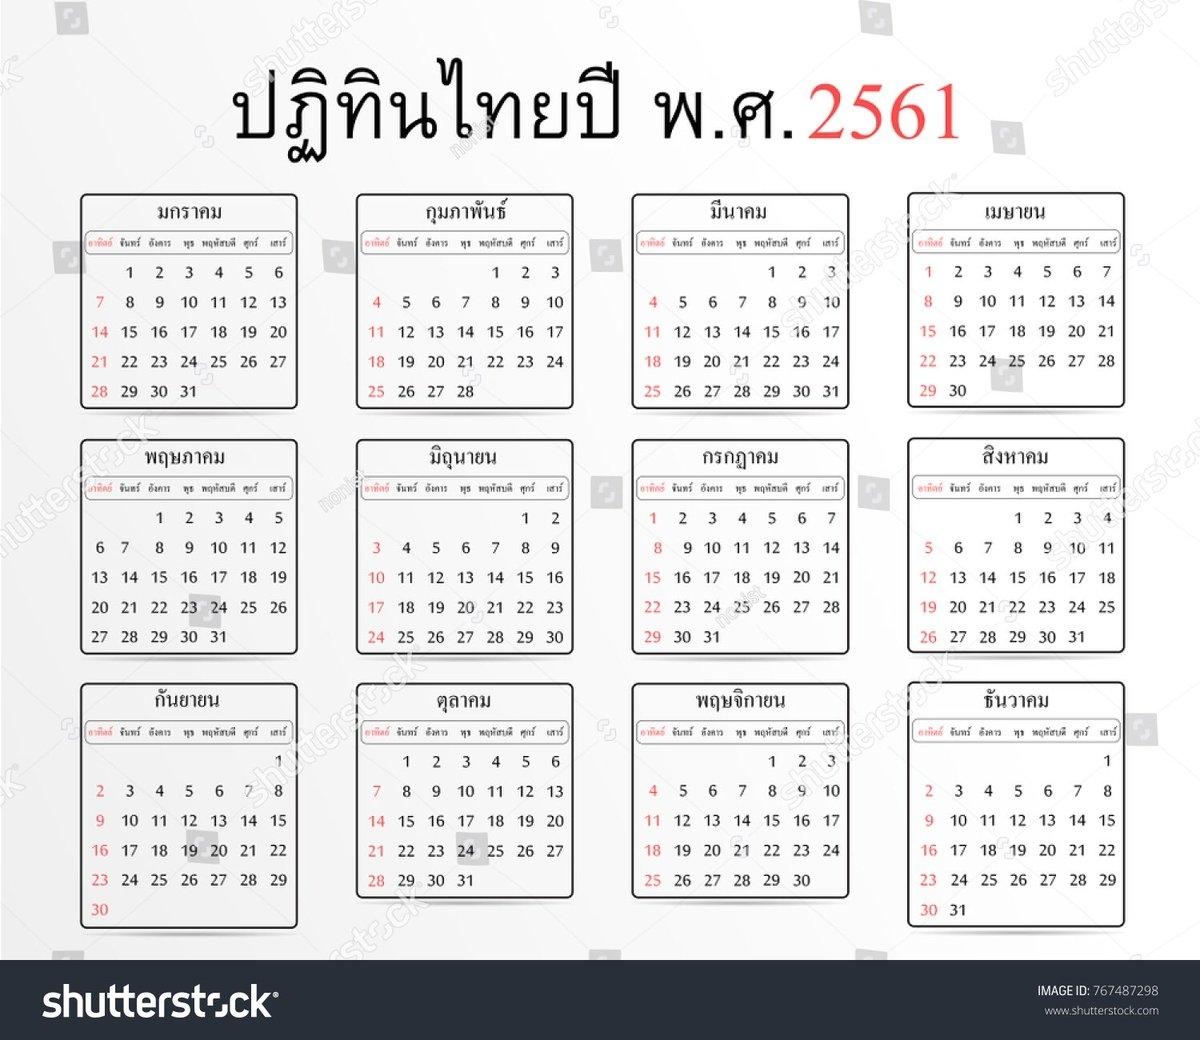 "Gilles Garachon On Twitter: ""in Thailand, The Solar Calendar Has"